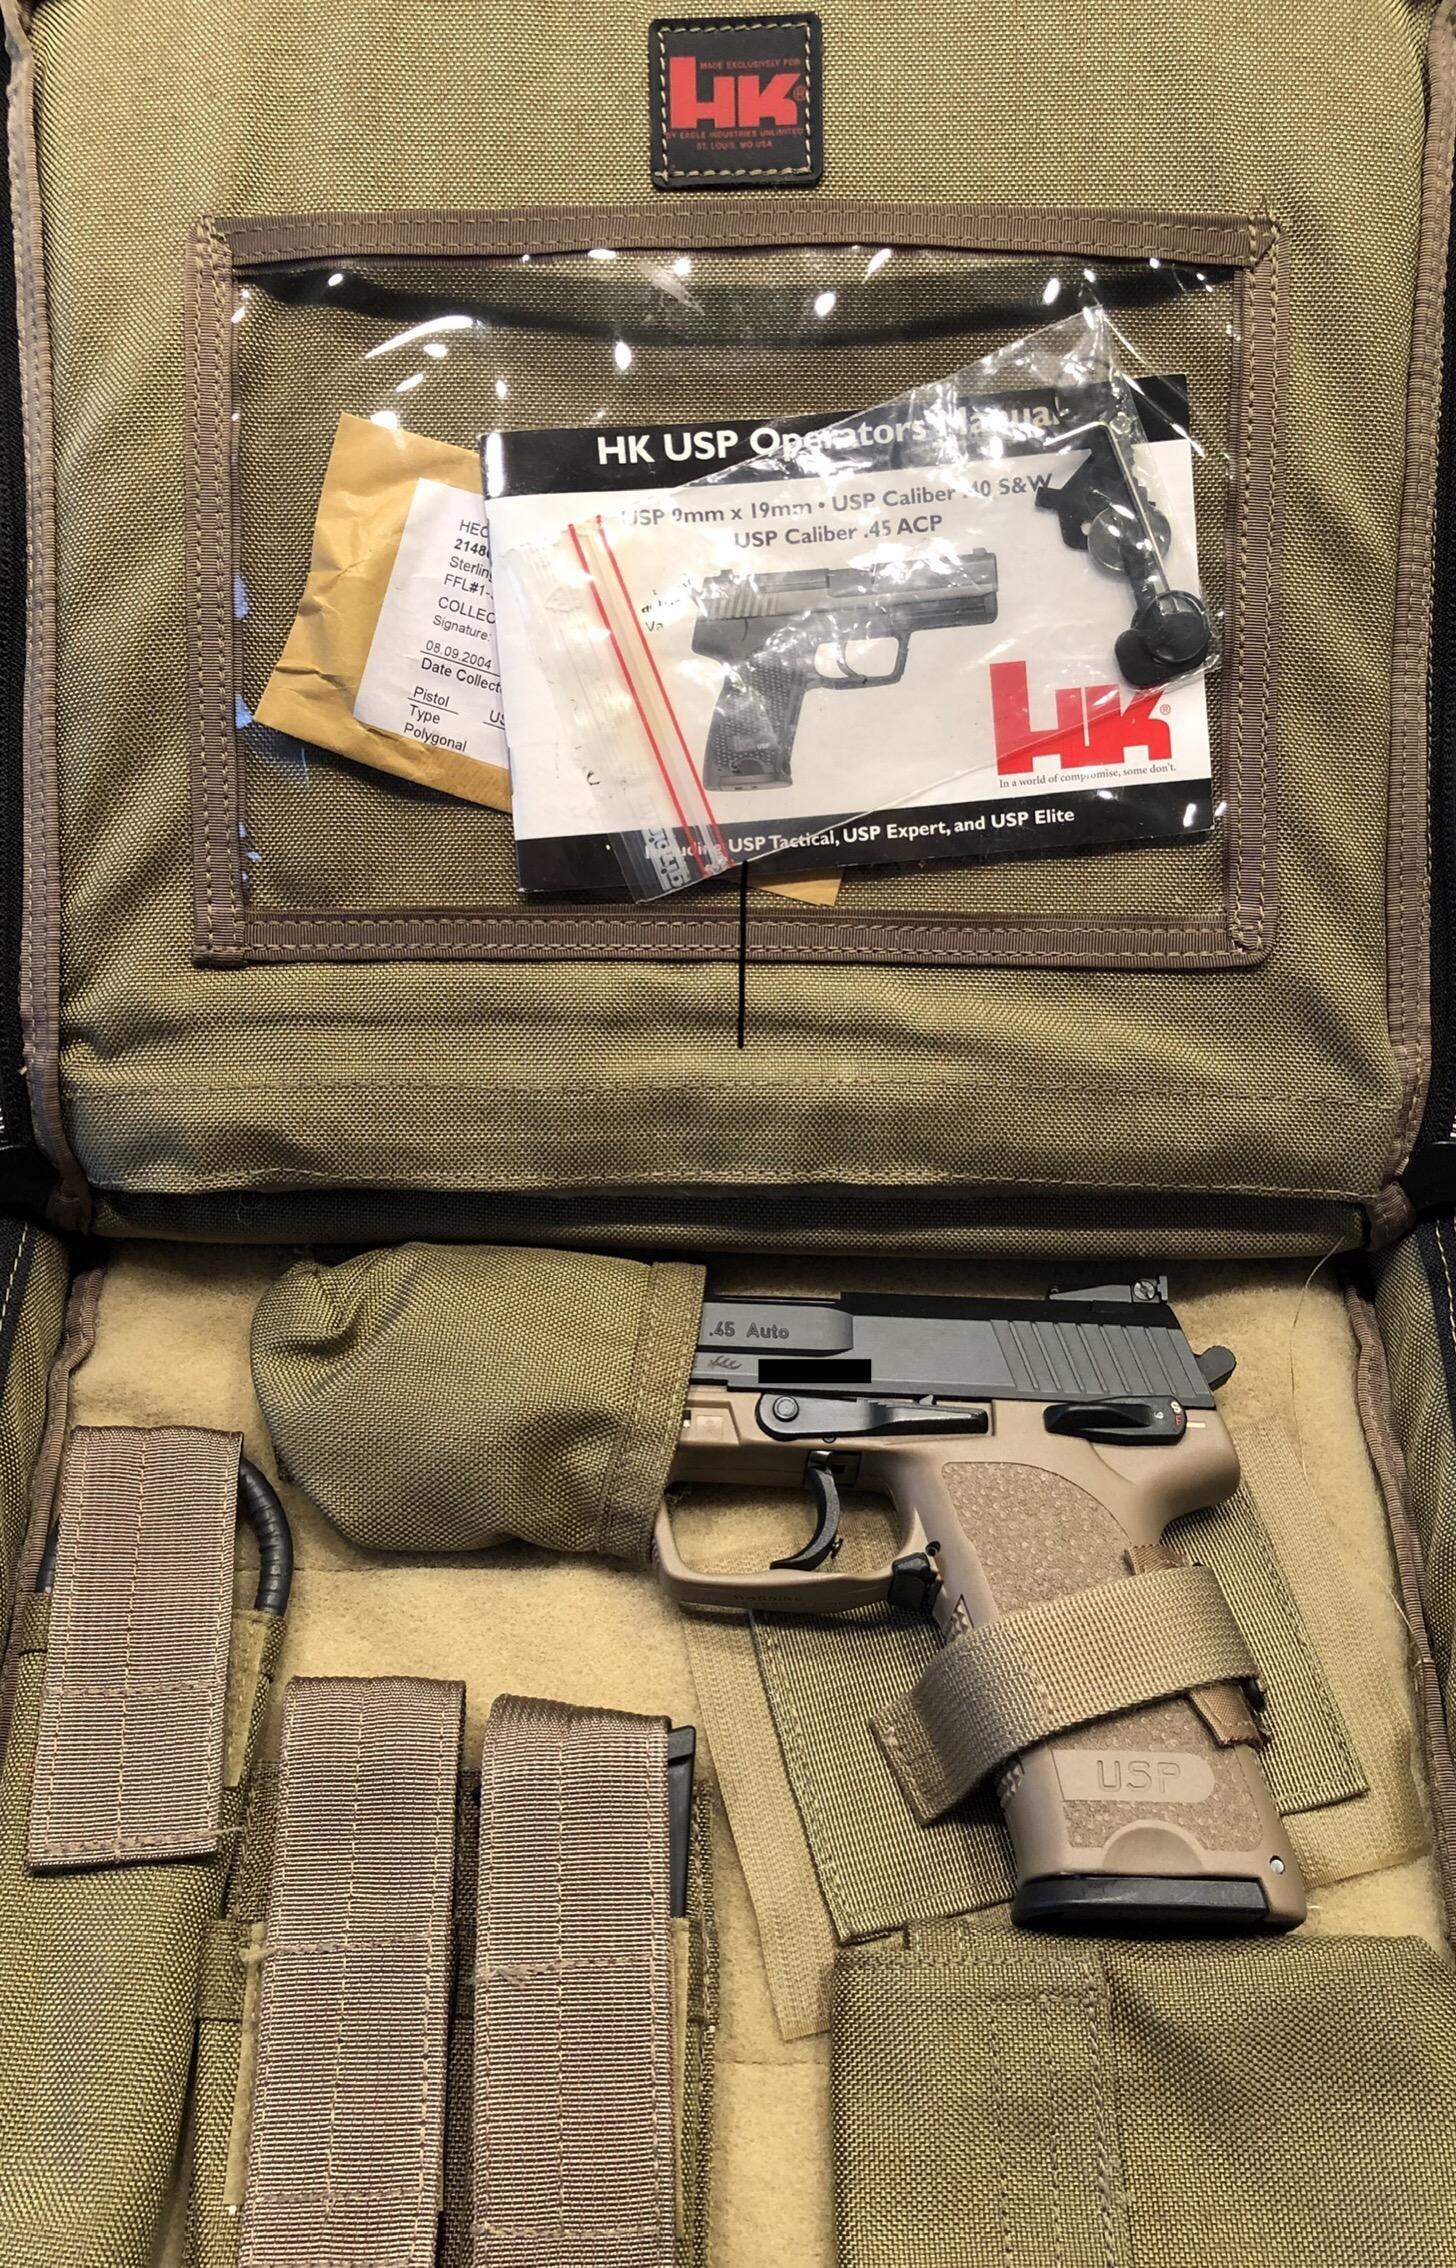 SOLD: HK USP .45 Tan Tactical (FDE)-b3b7e247-e6fe-4a46-a807-d989a8cc2afc.jpeg